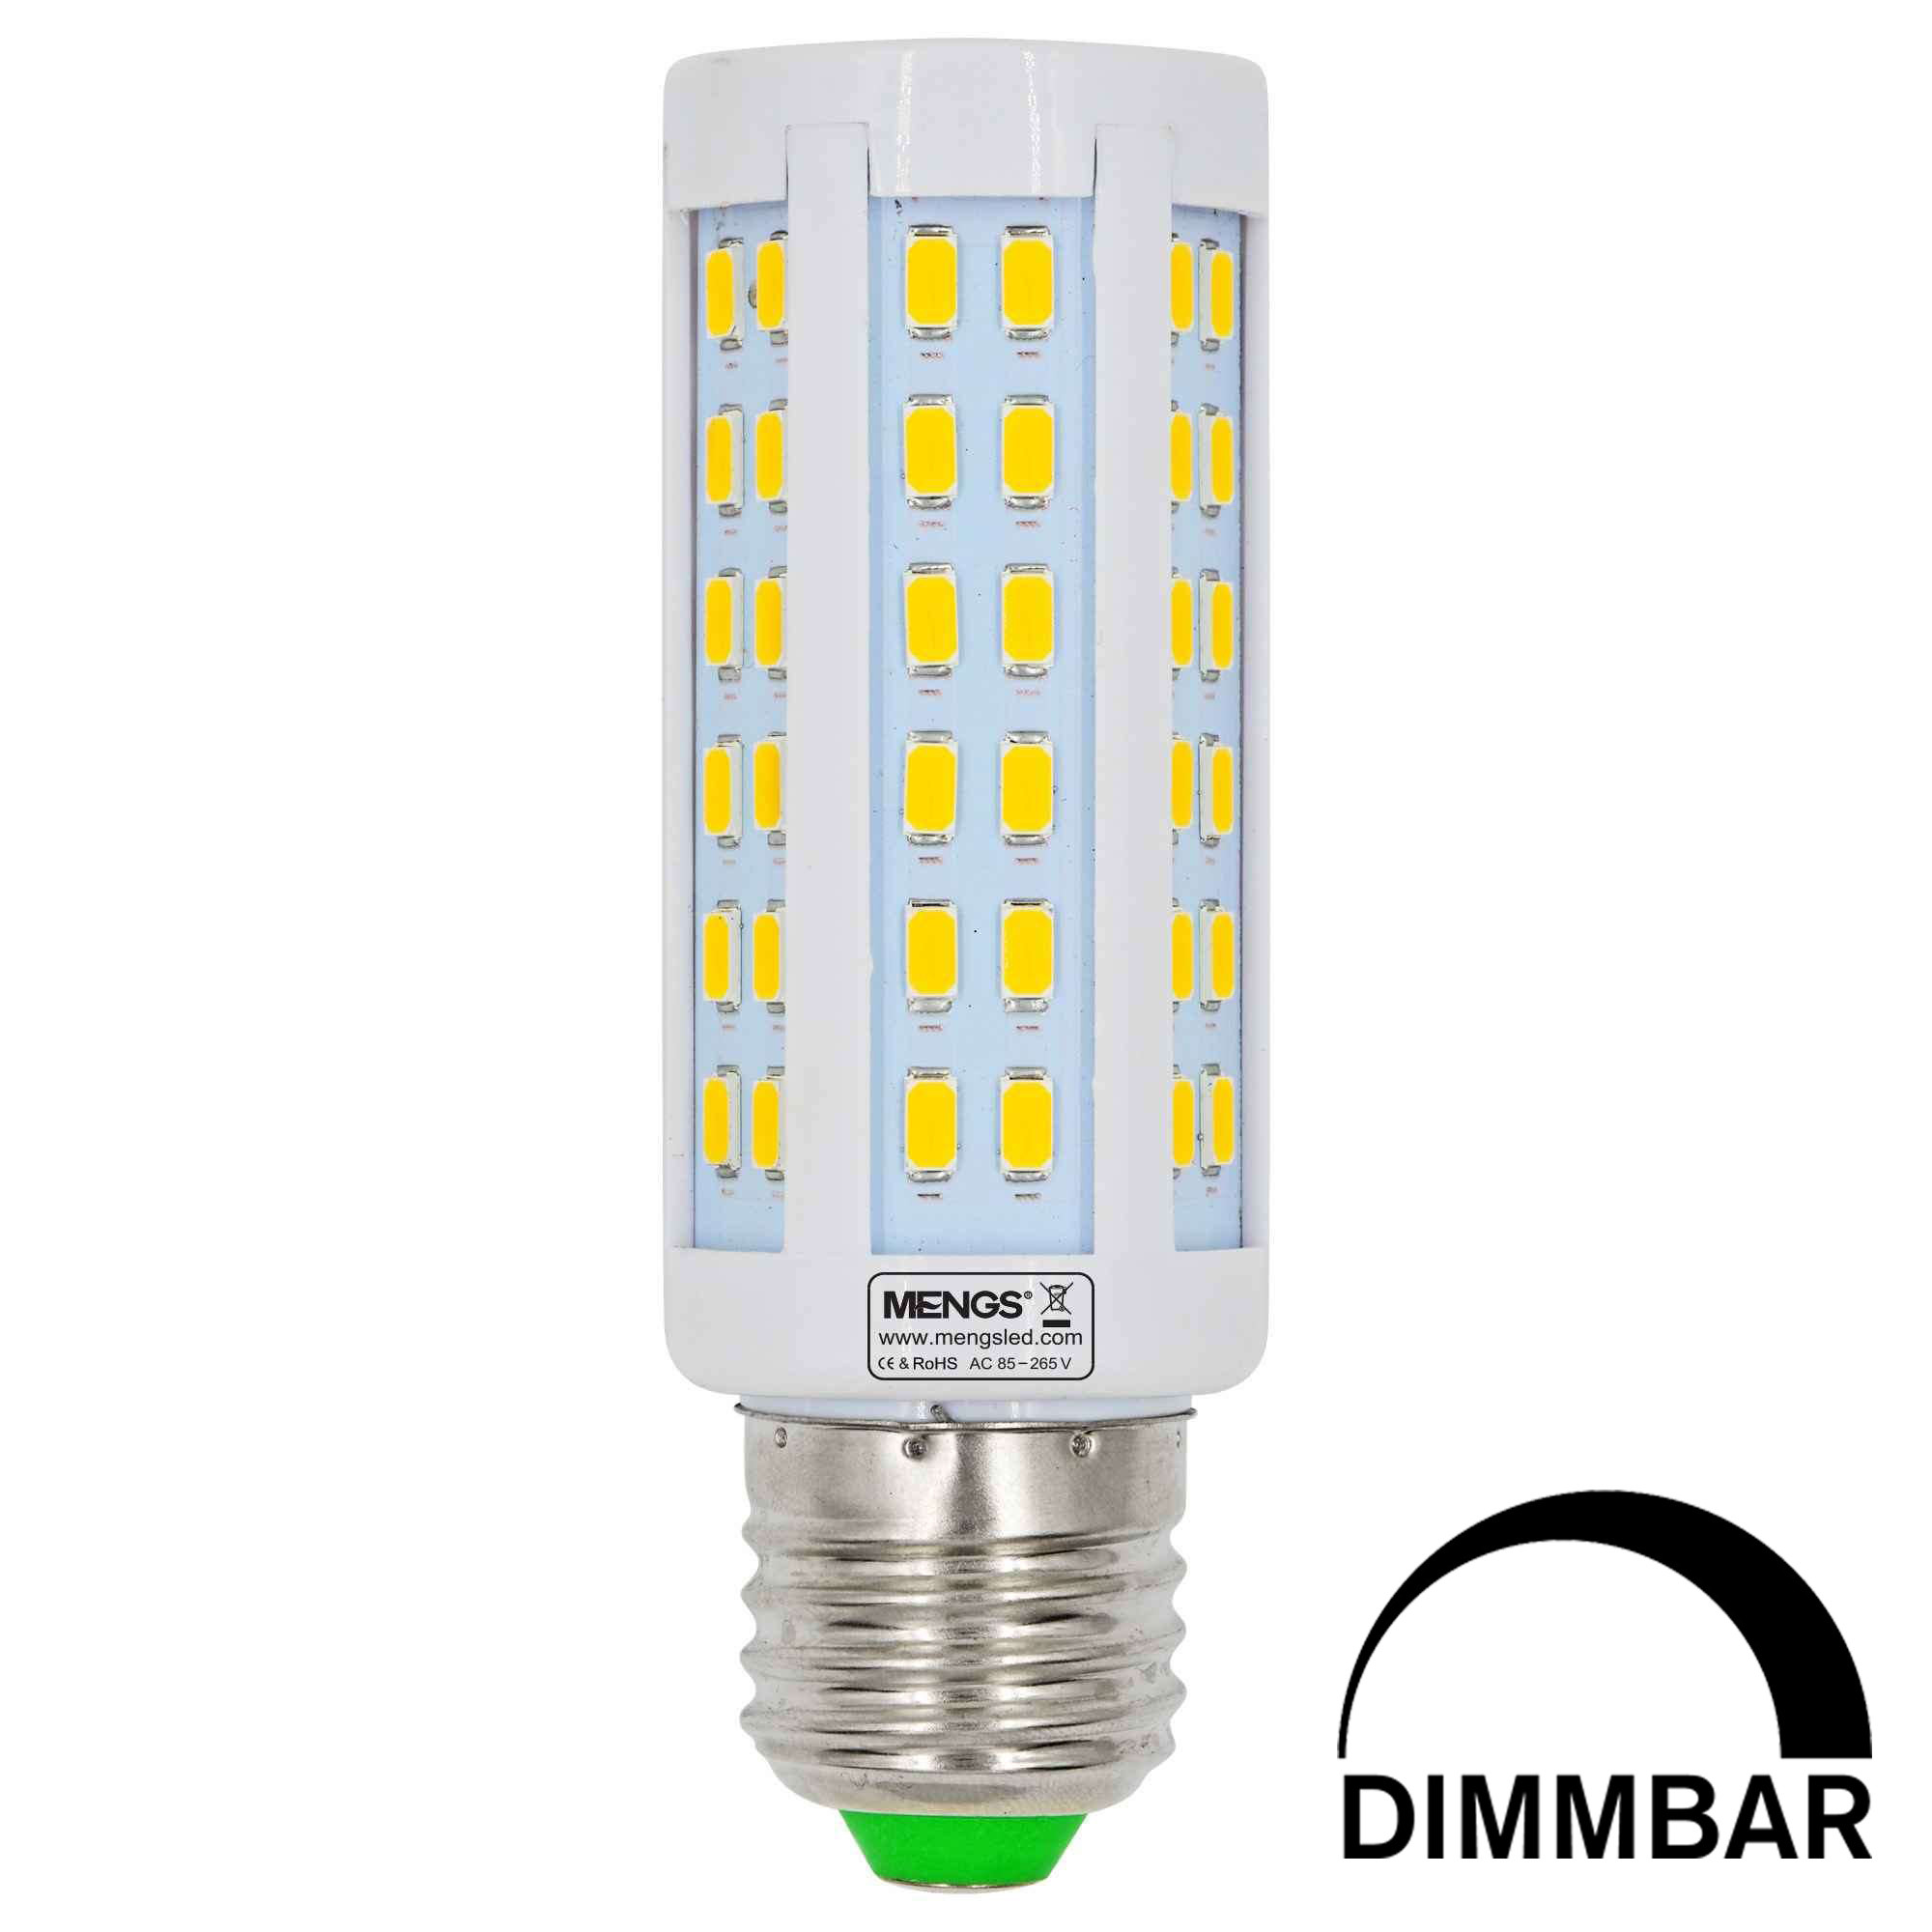 MENGS® E27 10W  LED Dimmable Corn Light 84x 5730 SMD LED Bulb Lamp AC 85-265V in Warm White Energy-Saving Light